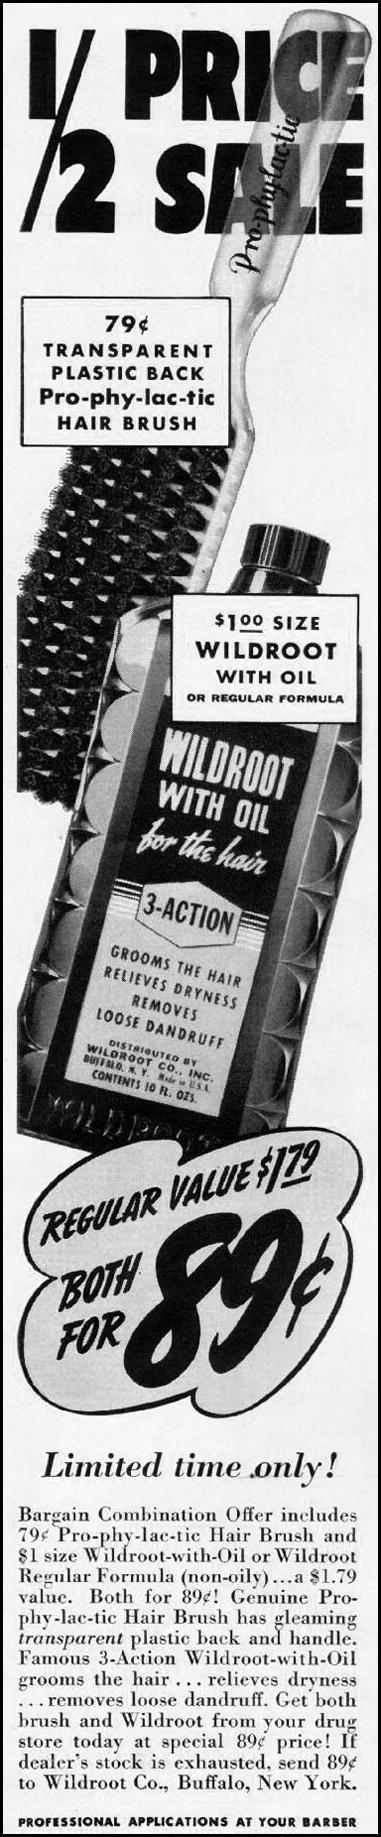 WLIDROOT HAIR TONIC LIFE 09/29/1941 p. 100